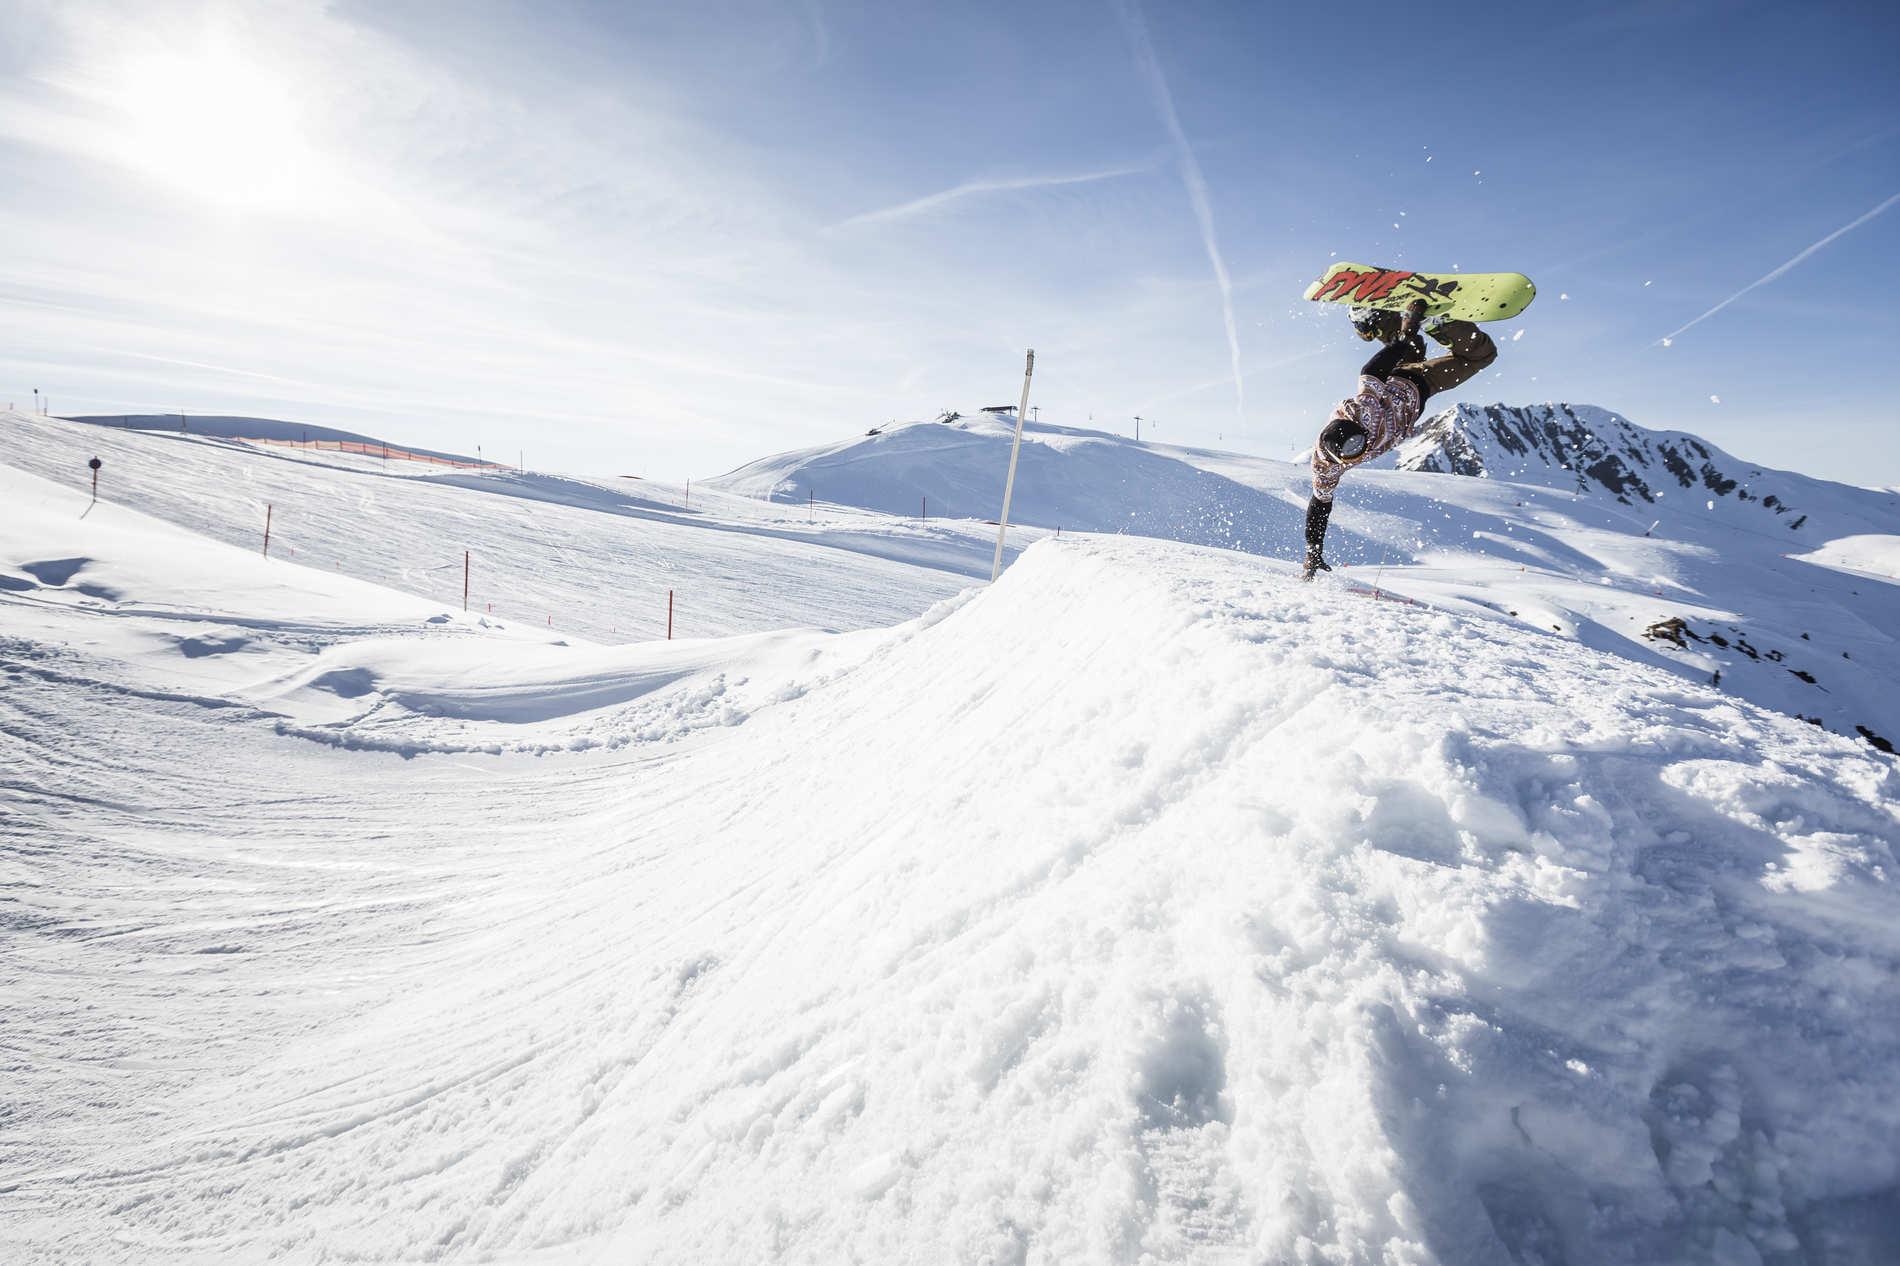 snowpark kitzbuehel 24 03 2018 action christoph klaushofer by roland haschka 092